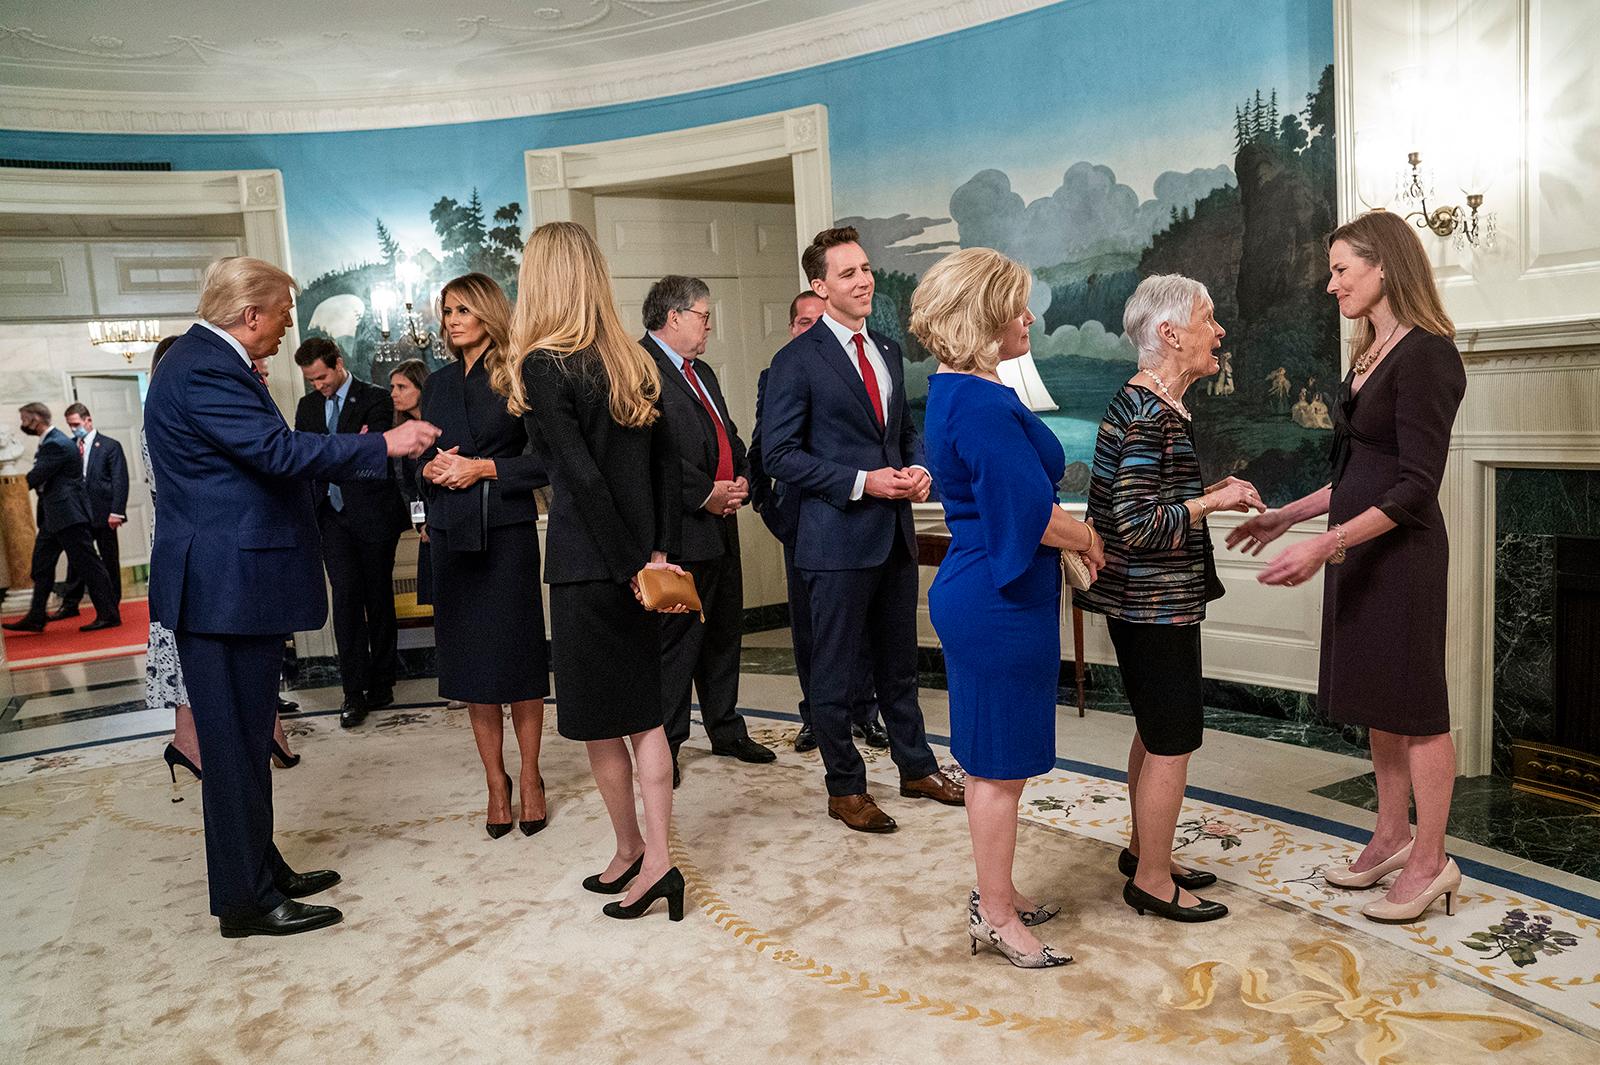 Barrett talks with Maureen Scalia, wife of late Supreme Court Justice Antonin Scalia.